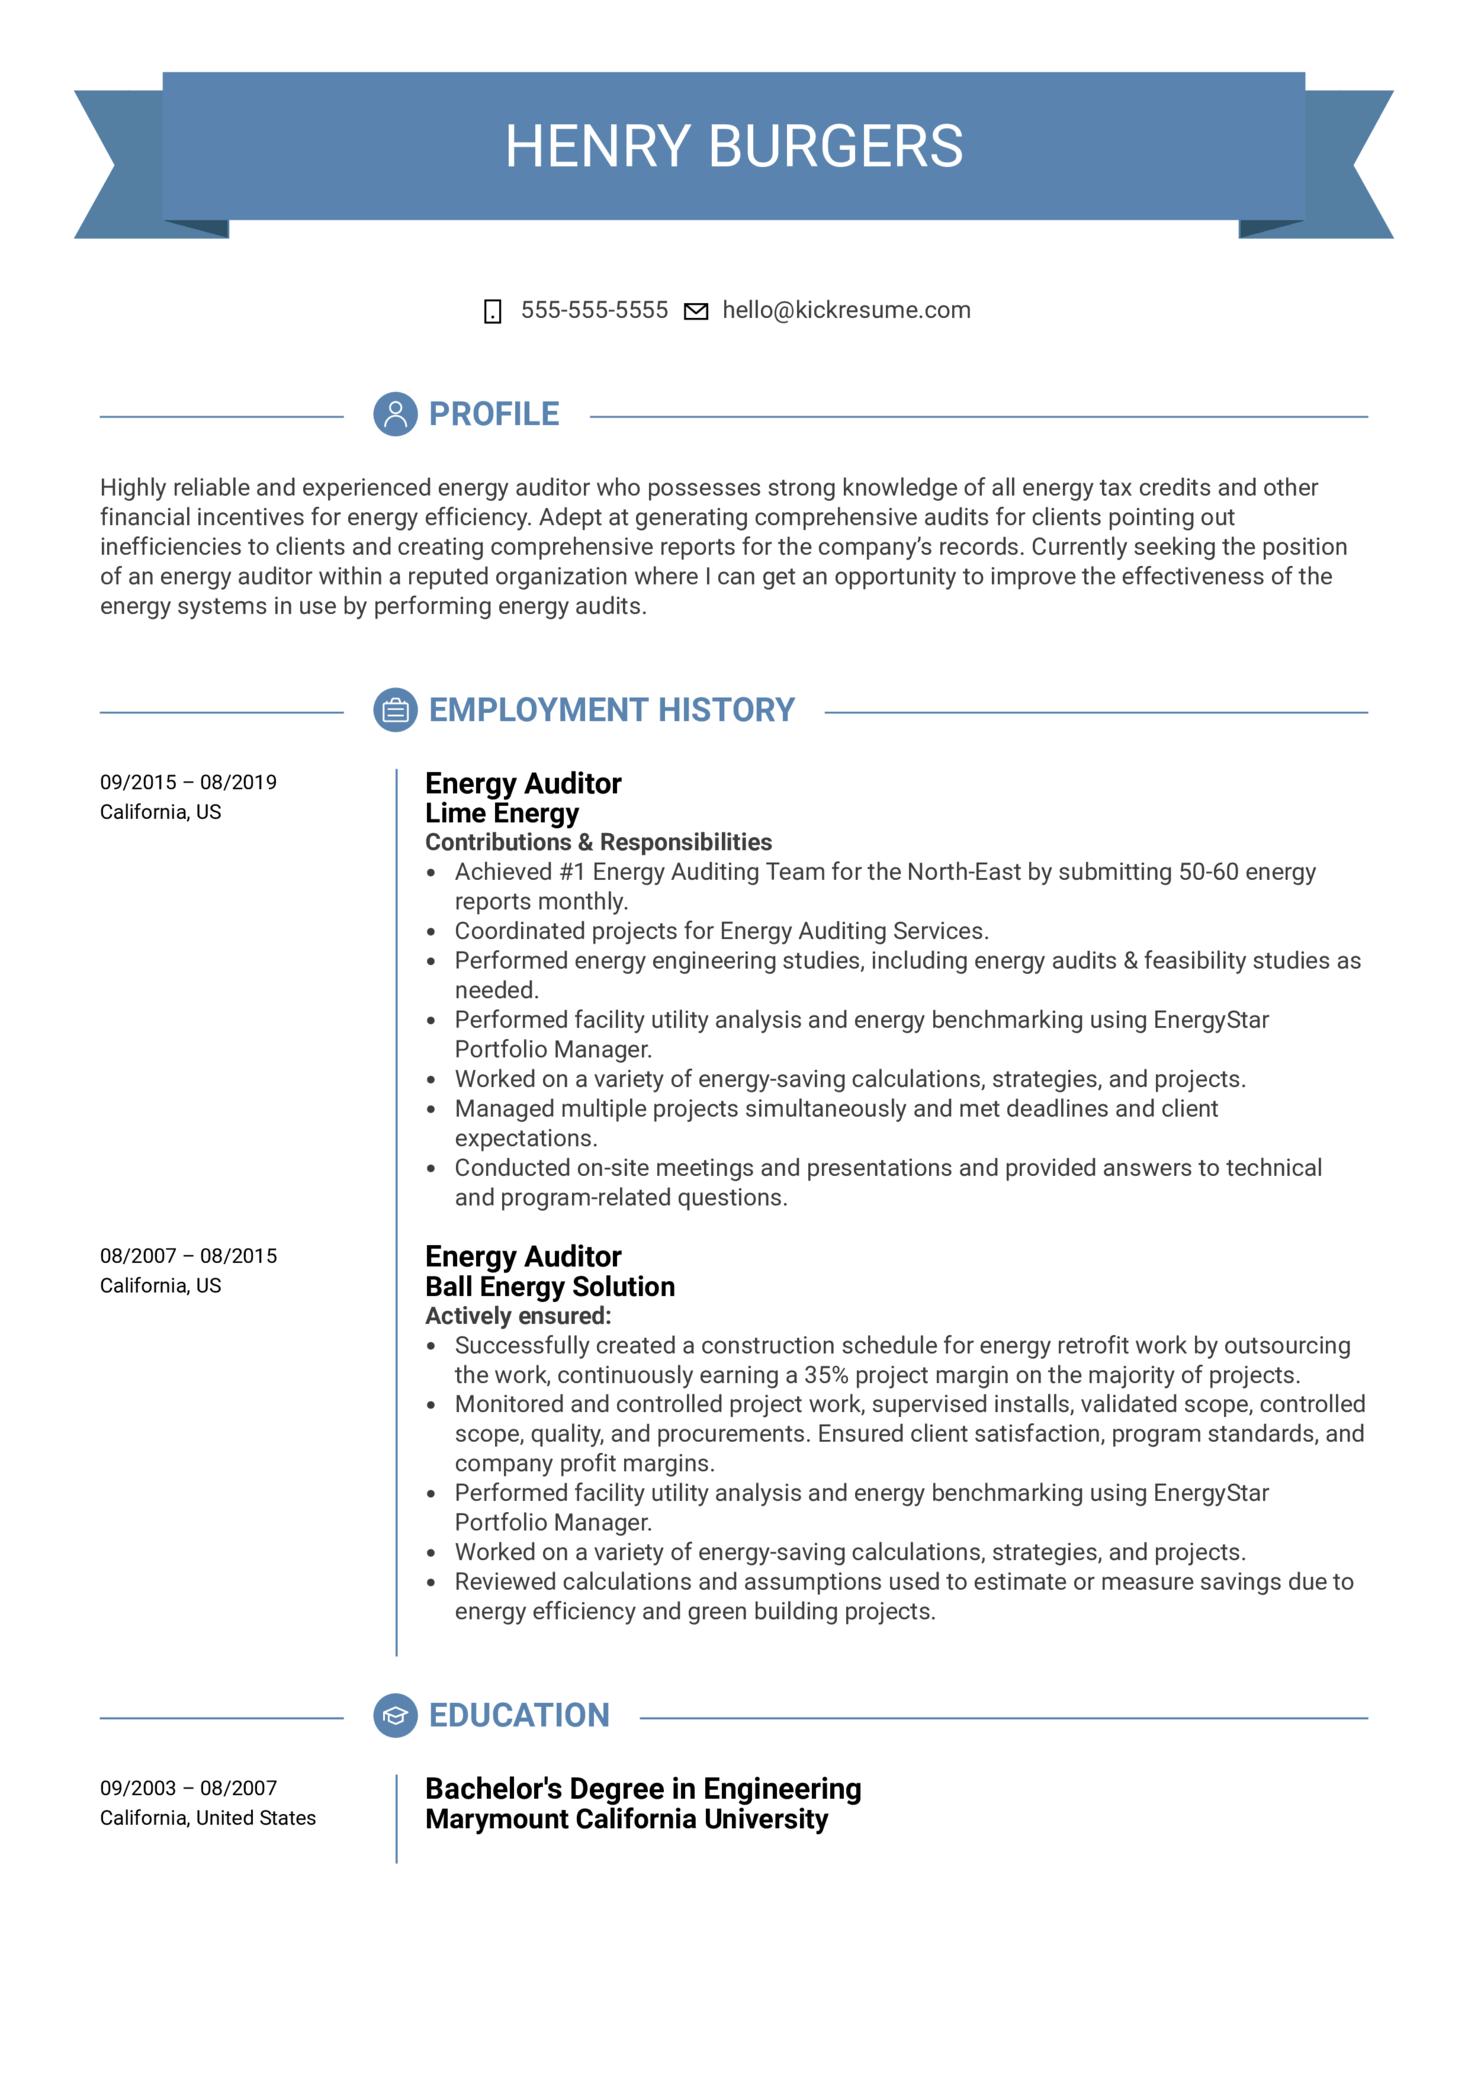 Energy Auditor Resume Sample (Part 1)